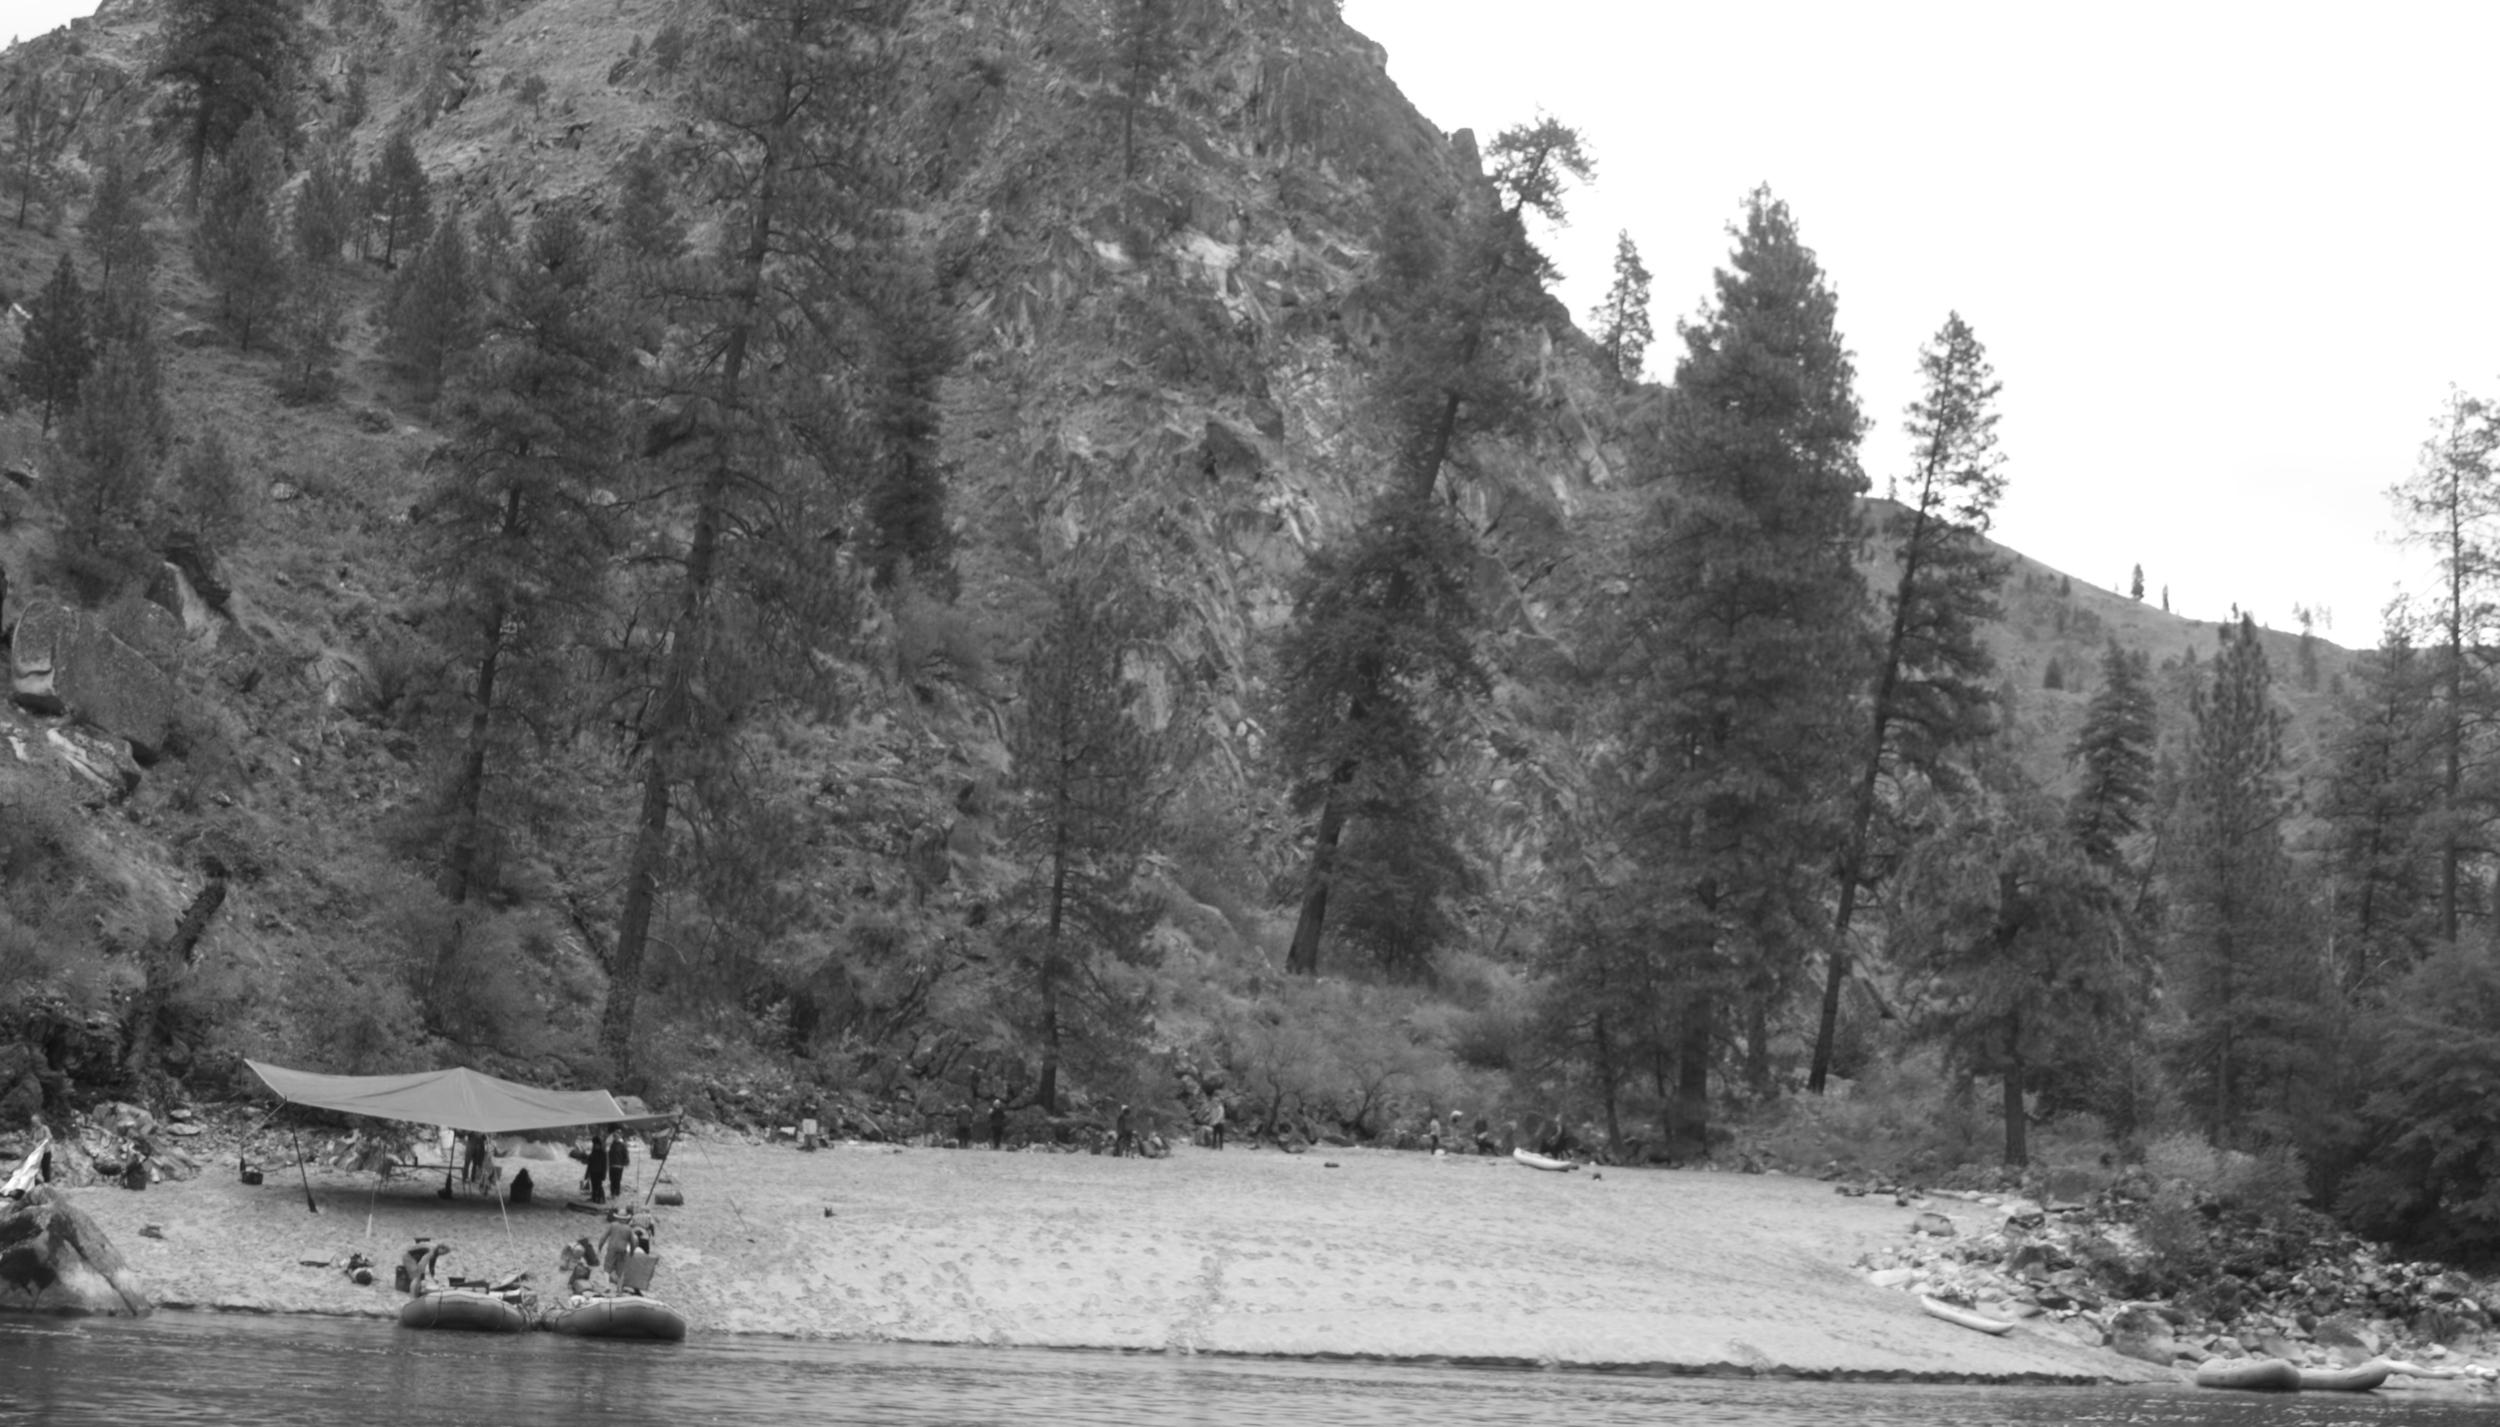 River of No Return, Last trip of the season